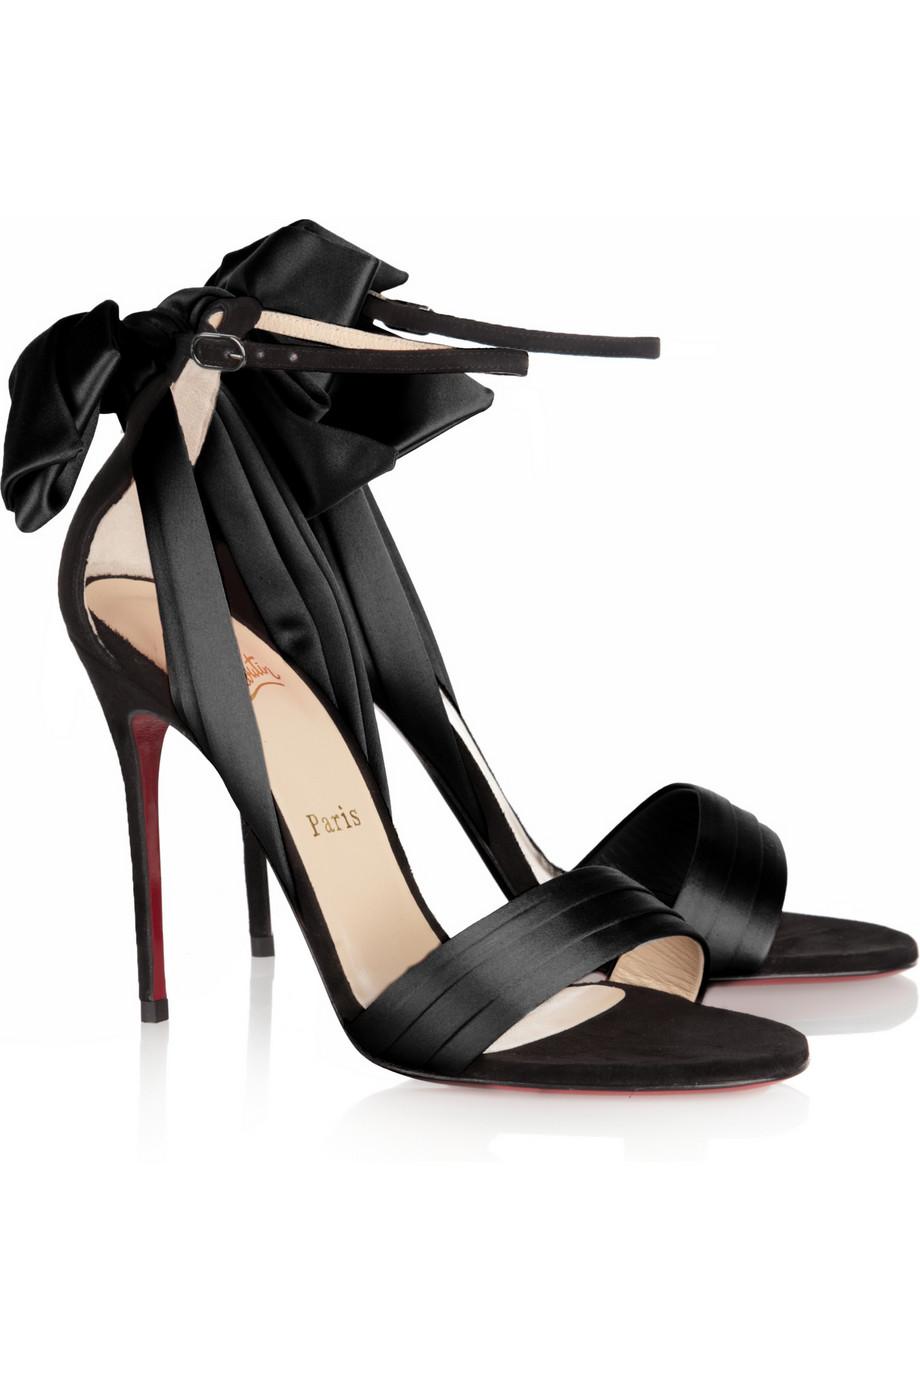 562a62f224c cheapest louboutin black strappy sandals 6b0da 6585f